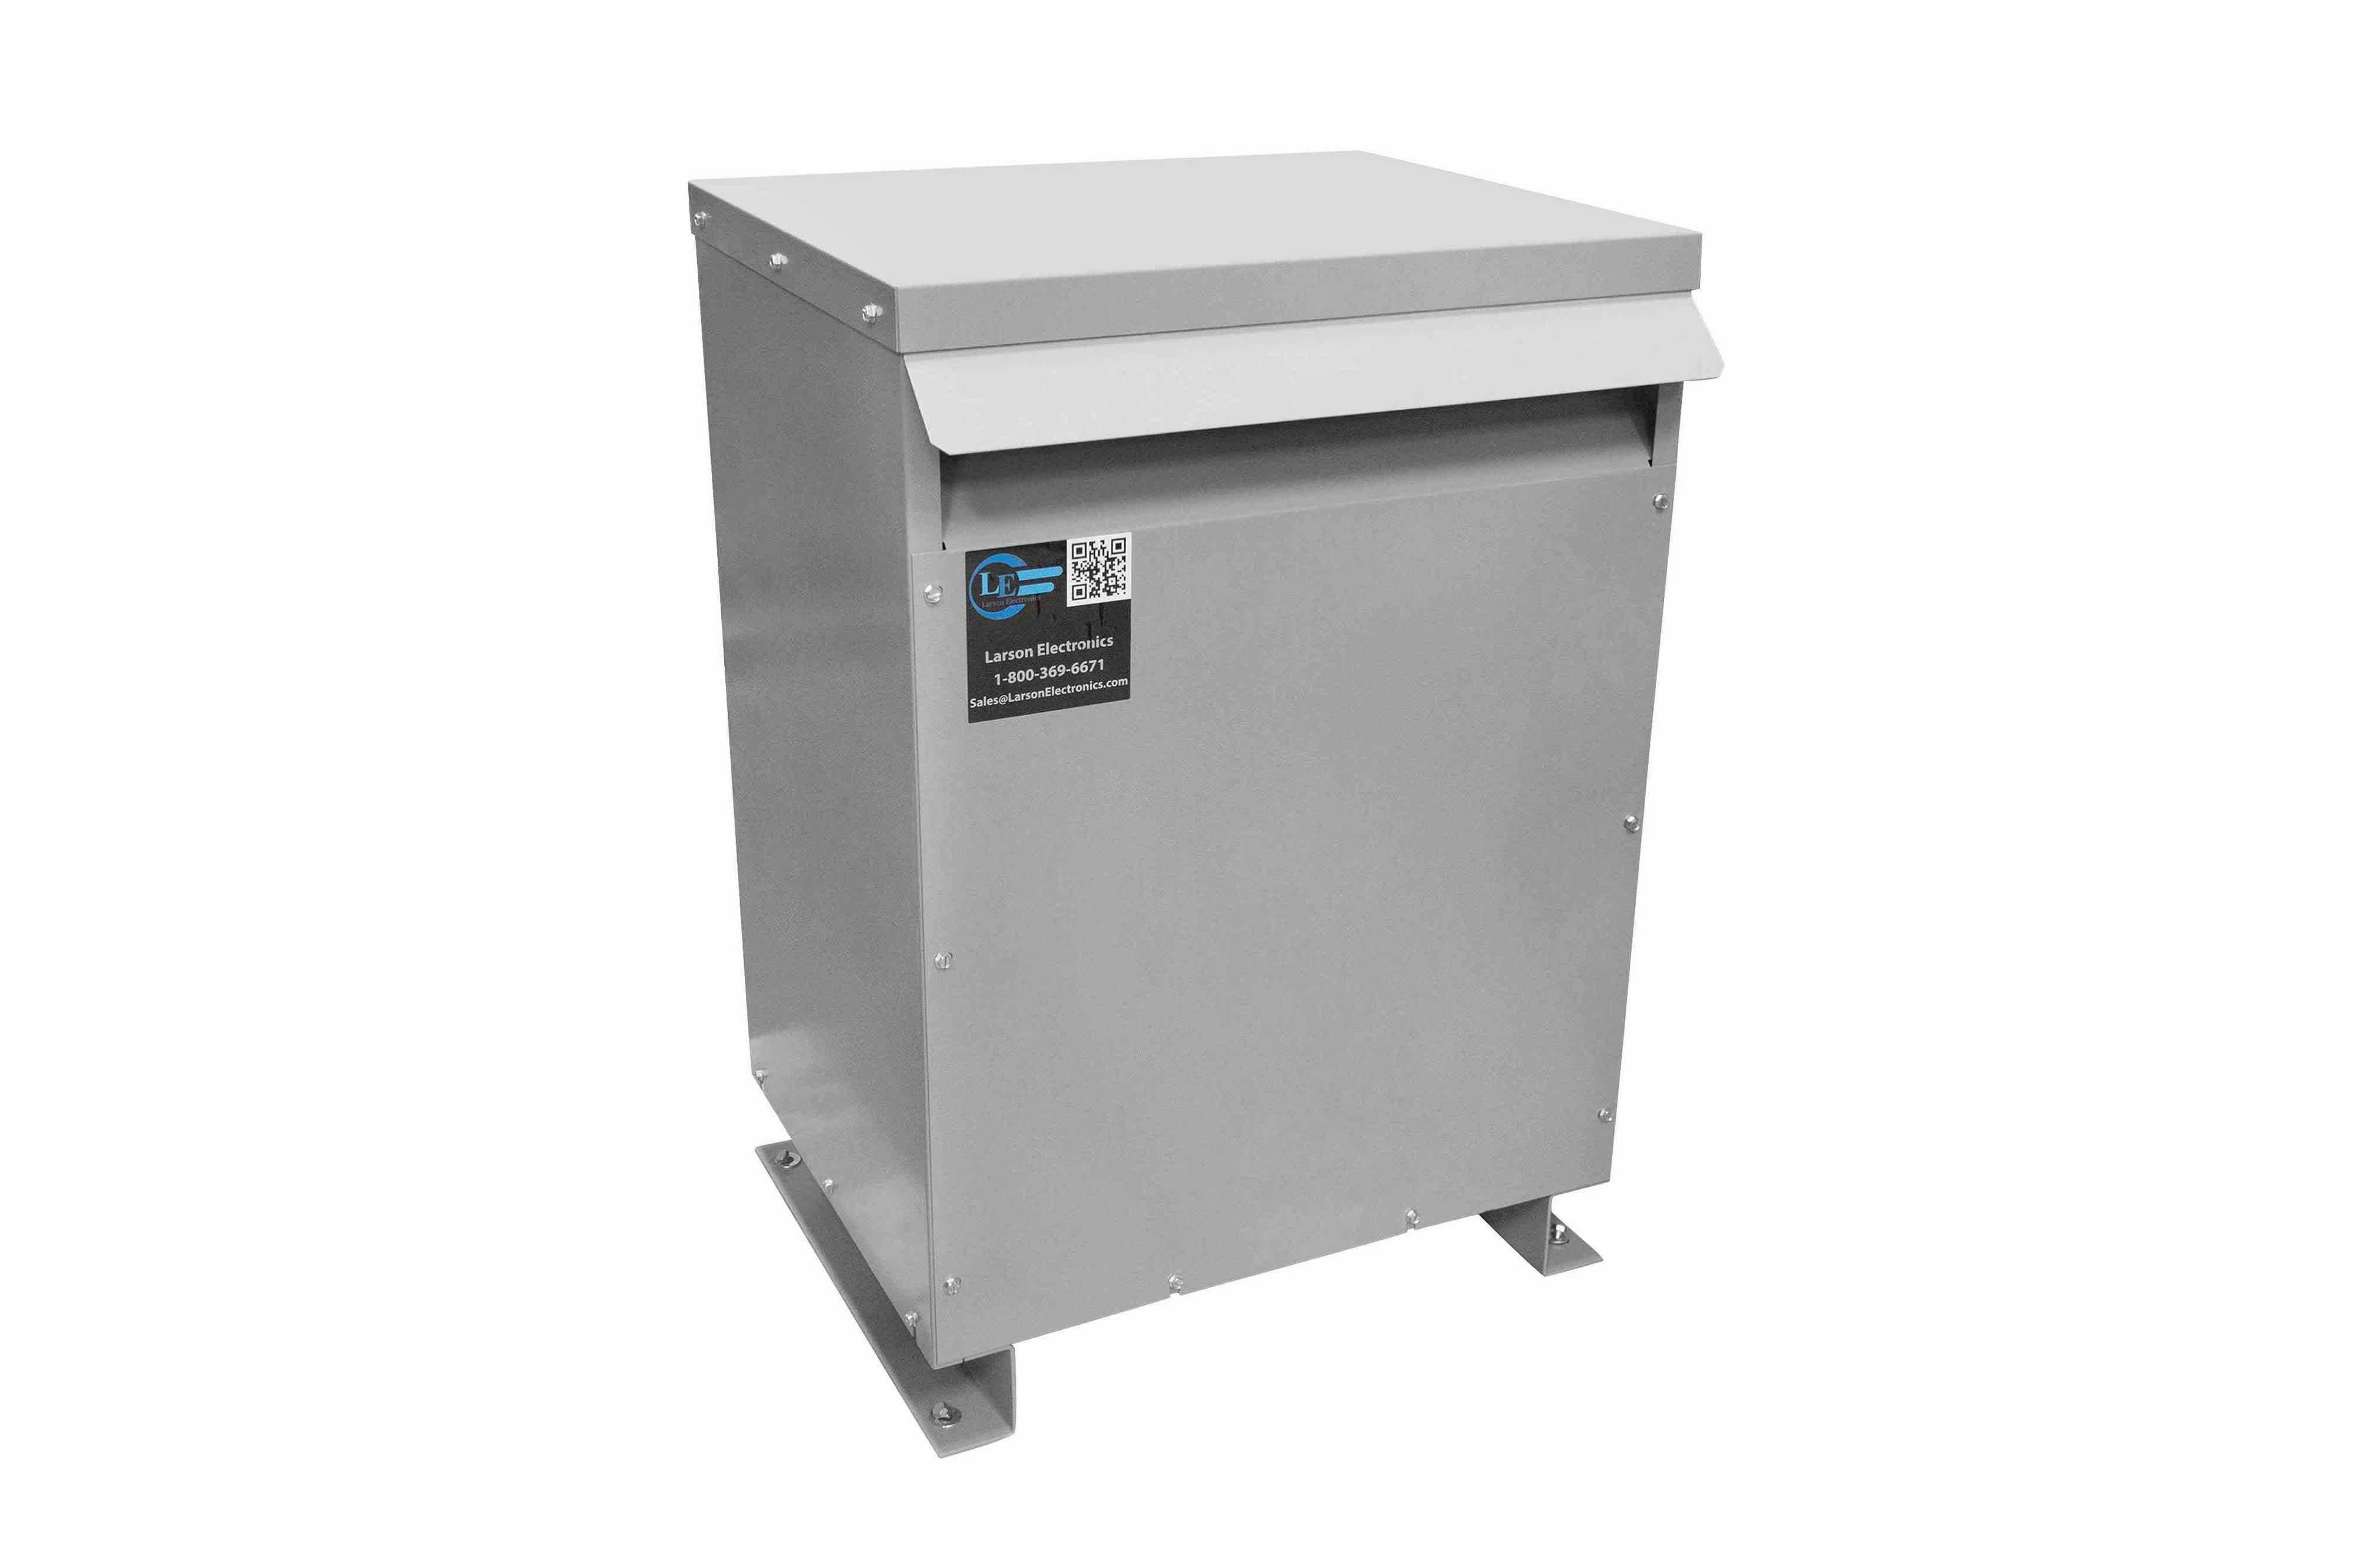 14 kVA 3PH Isolation Transformer, 600V Wye Primary, 208Y/120 Wye-N Secondary, N3R, Ventilated, 60 Hz